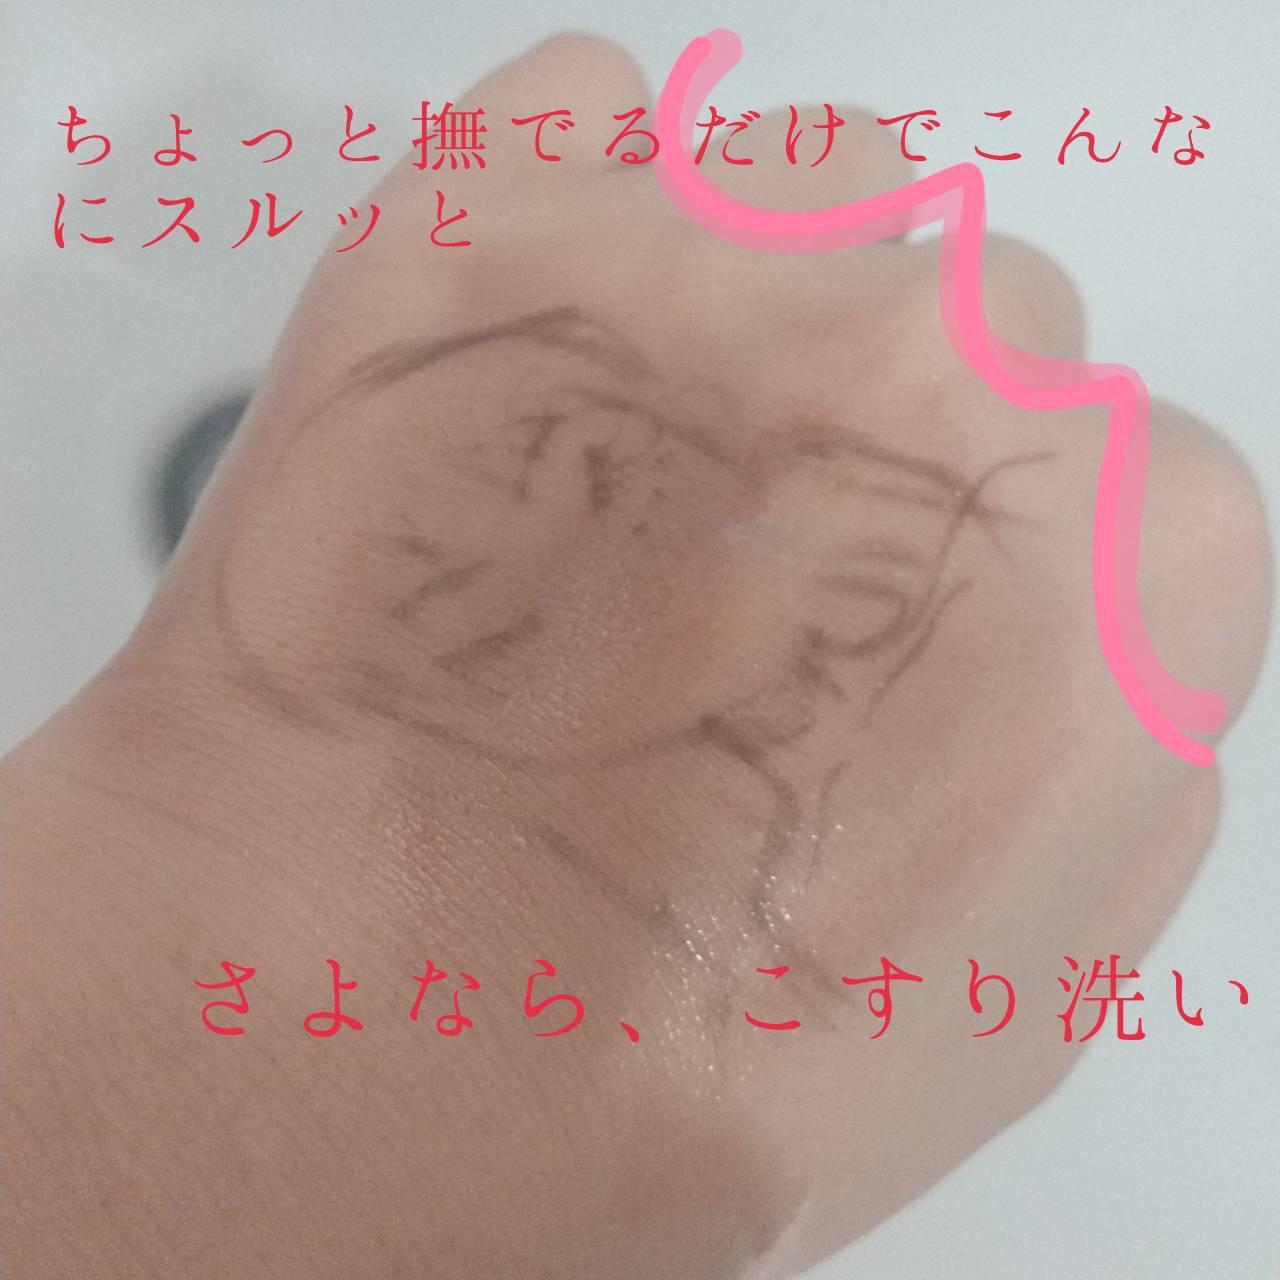 shu uemura(シュウ ウエムラ)アルティム8∞ スブリム ビューティ クレンジング オイルを使ったRIRIさんのクチコミ画像3